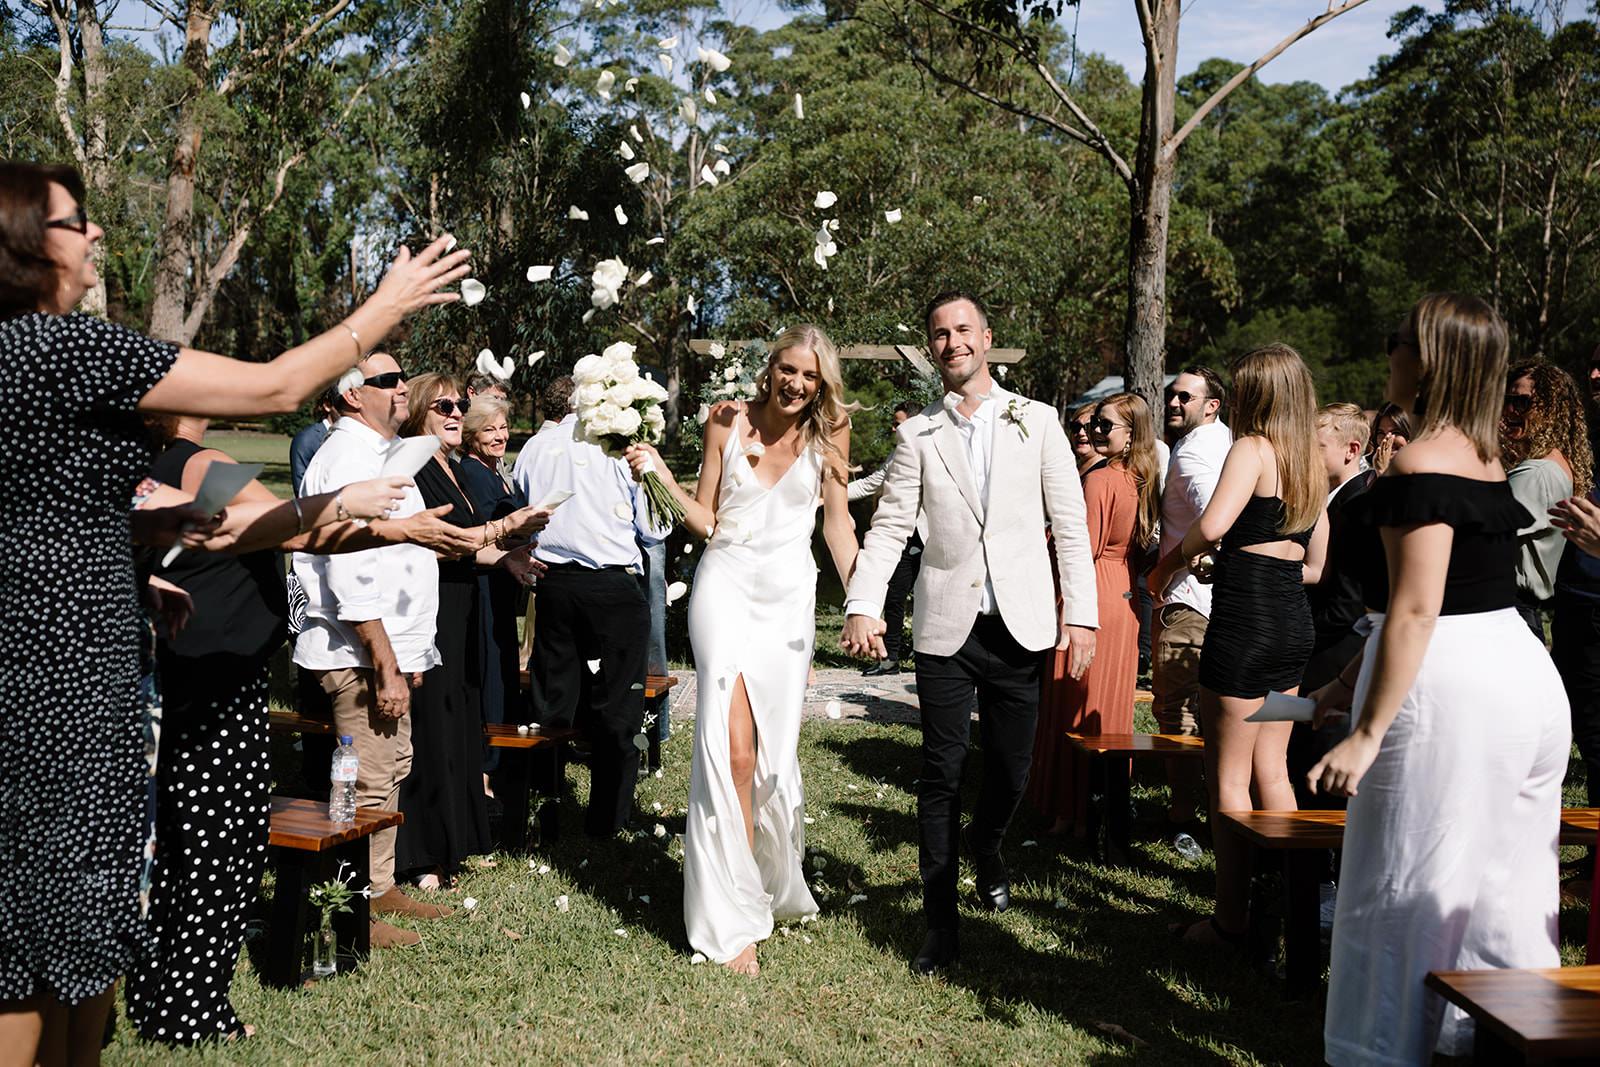 Garden wedding ceremony